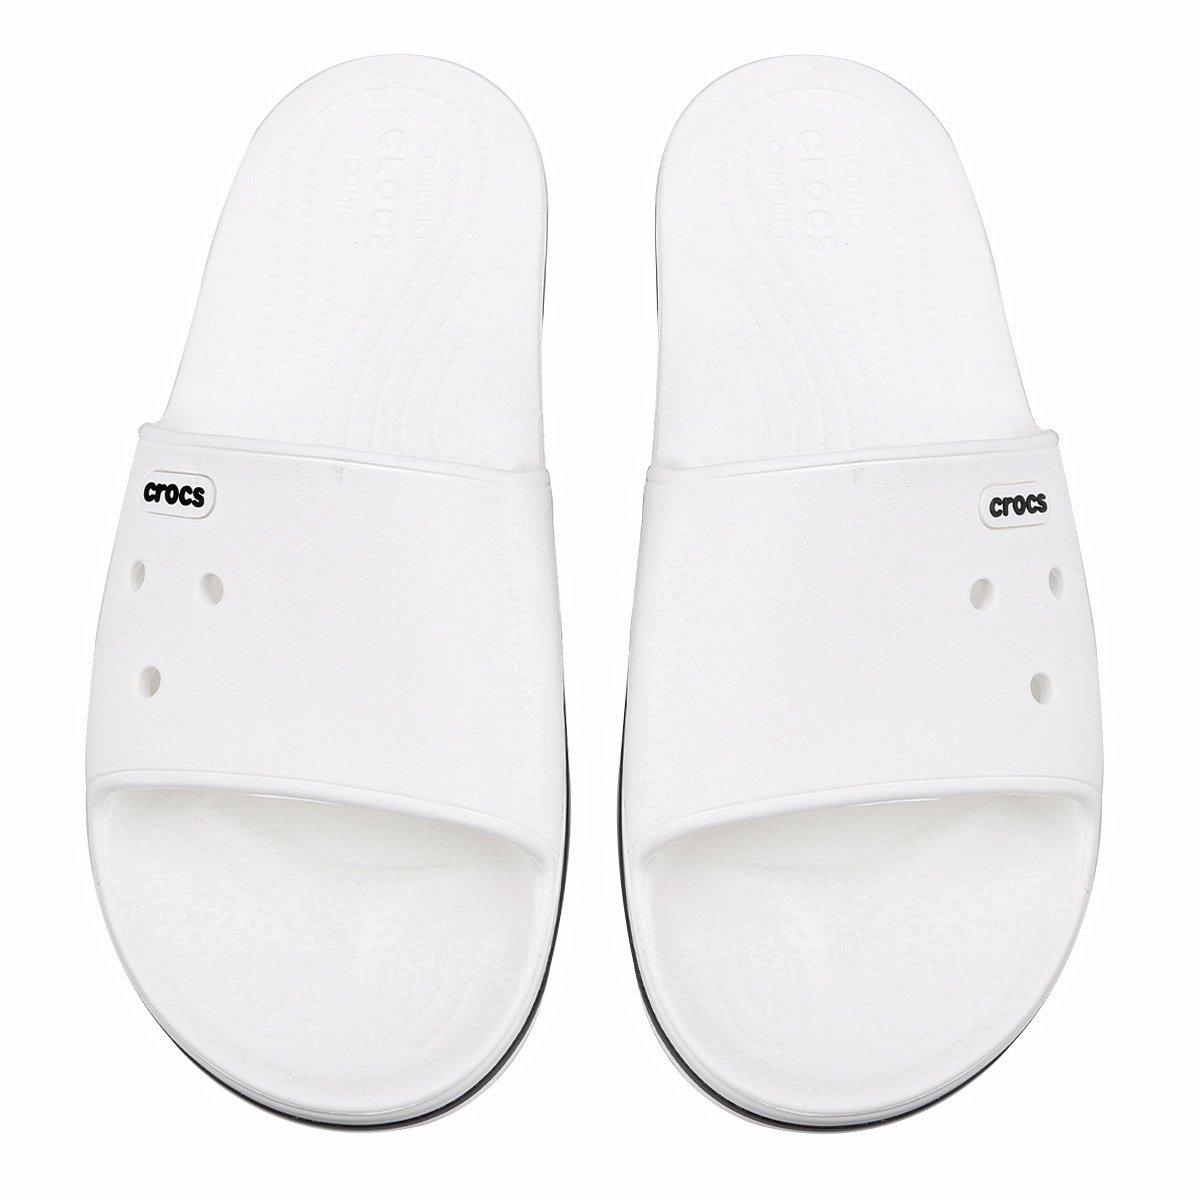 c07a7800c Chinelo Crocs Crocband III Slide - Branco e Preto - Compre Agora | Zattini